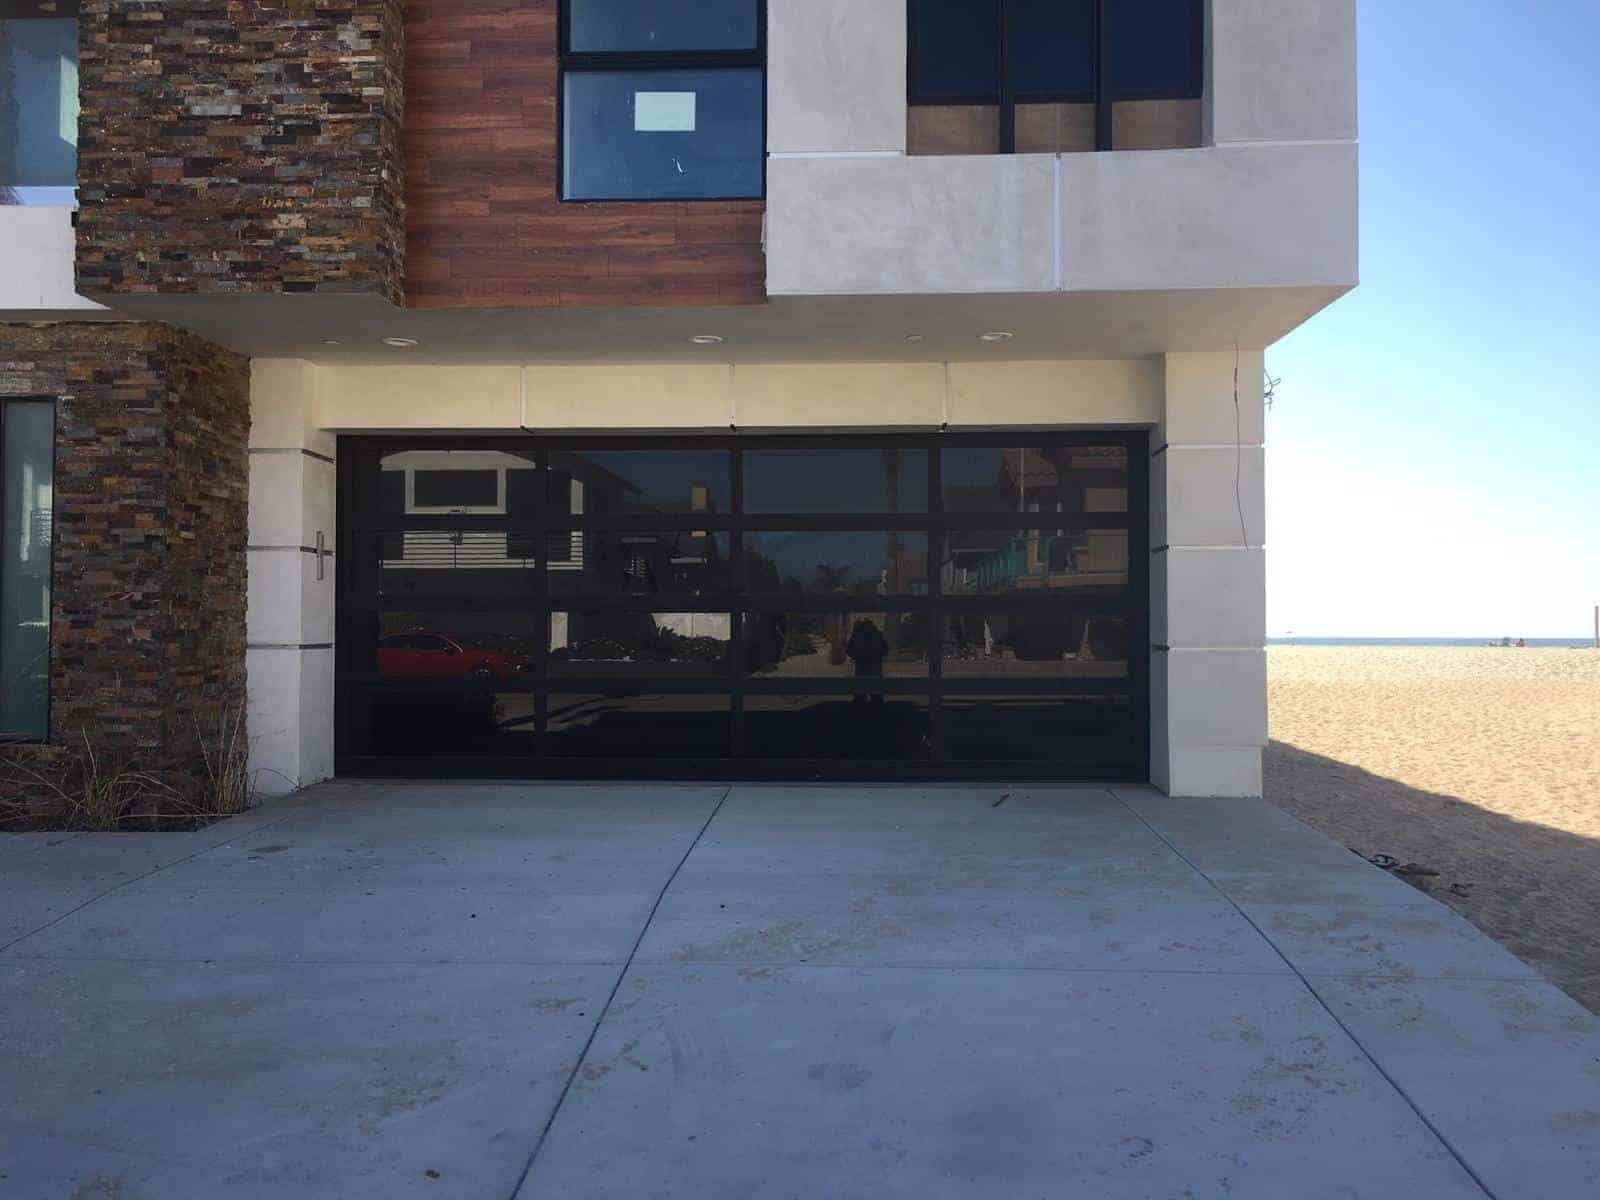 Millbrae CA Garage Door Repair & Replacement